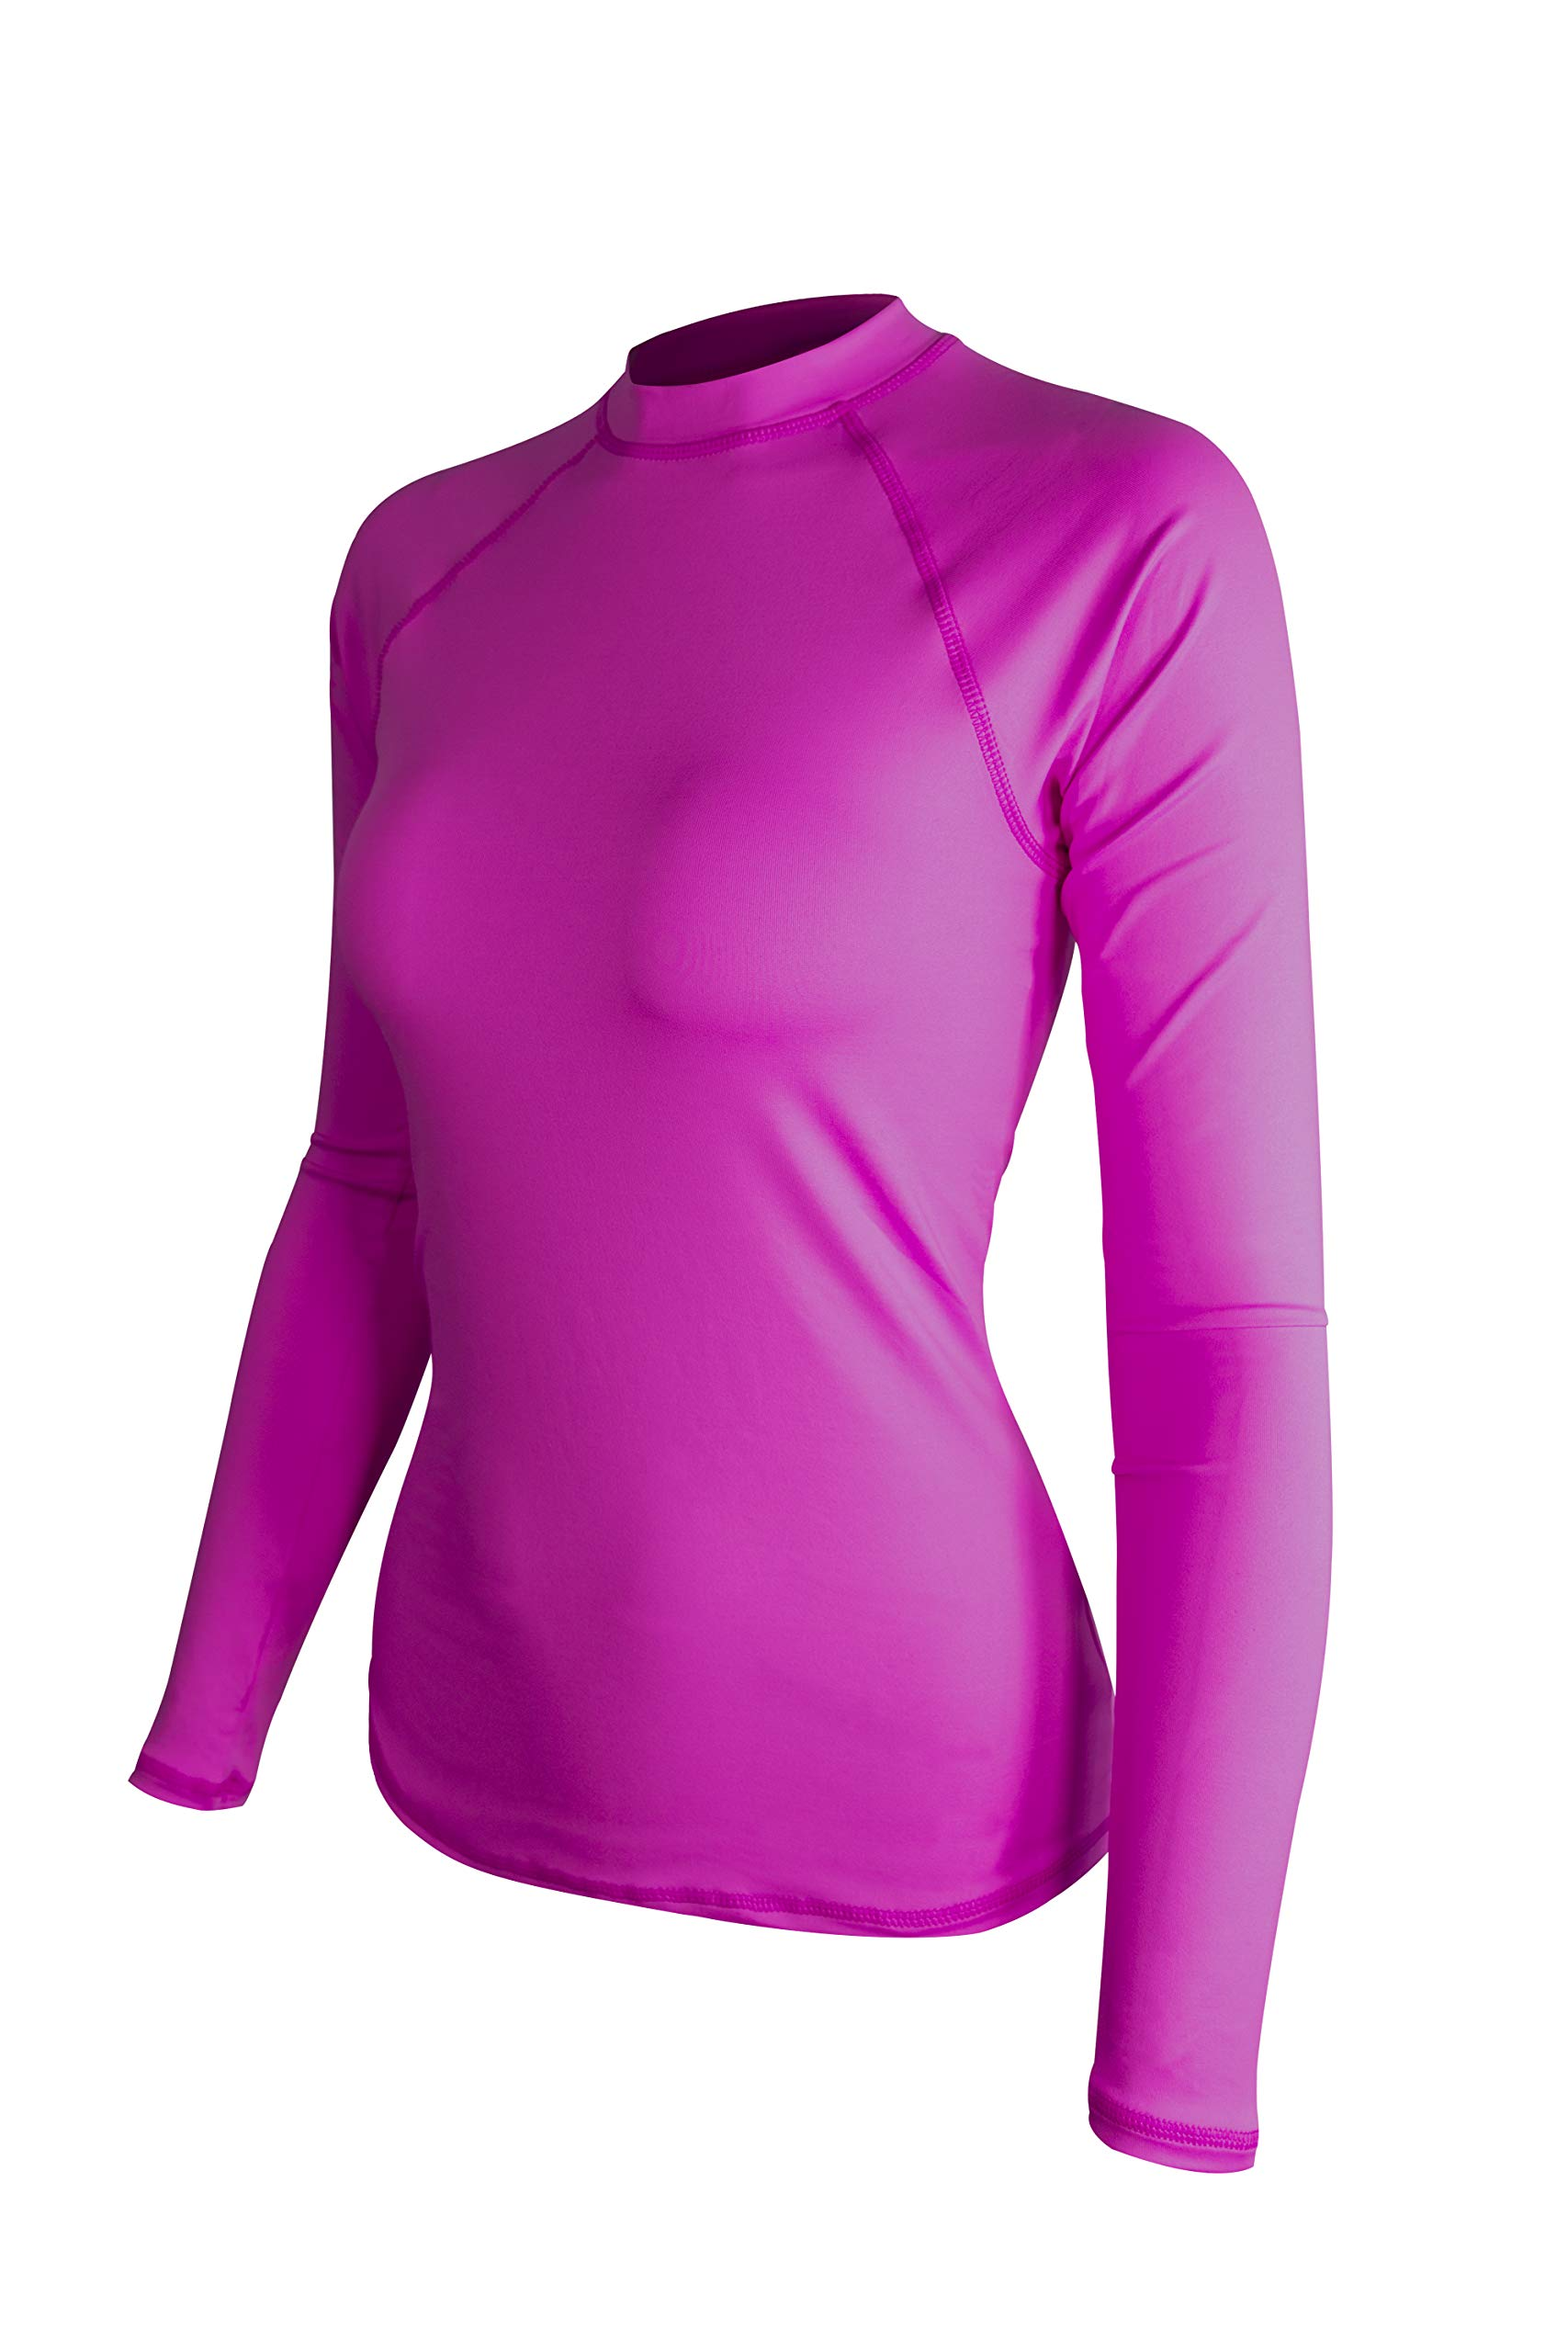 ALLEZ Women's Long Sleeve Rash Guard Athletic Tops Swimwear UPF 50+ Sun Protection Swim Shirts (Pink, Large) by ALLEZ